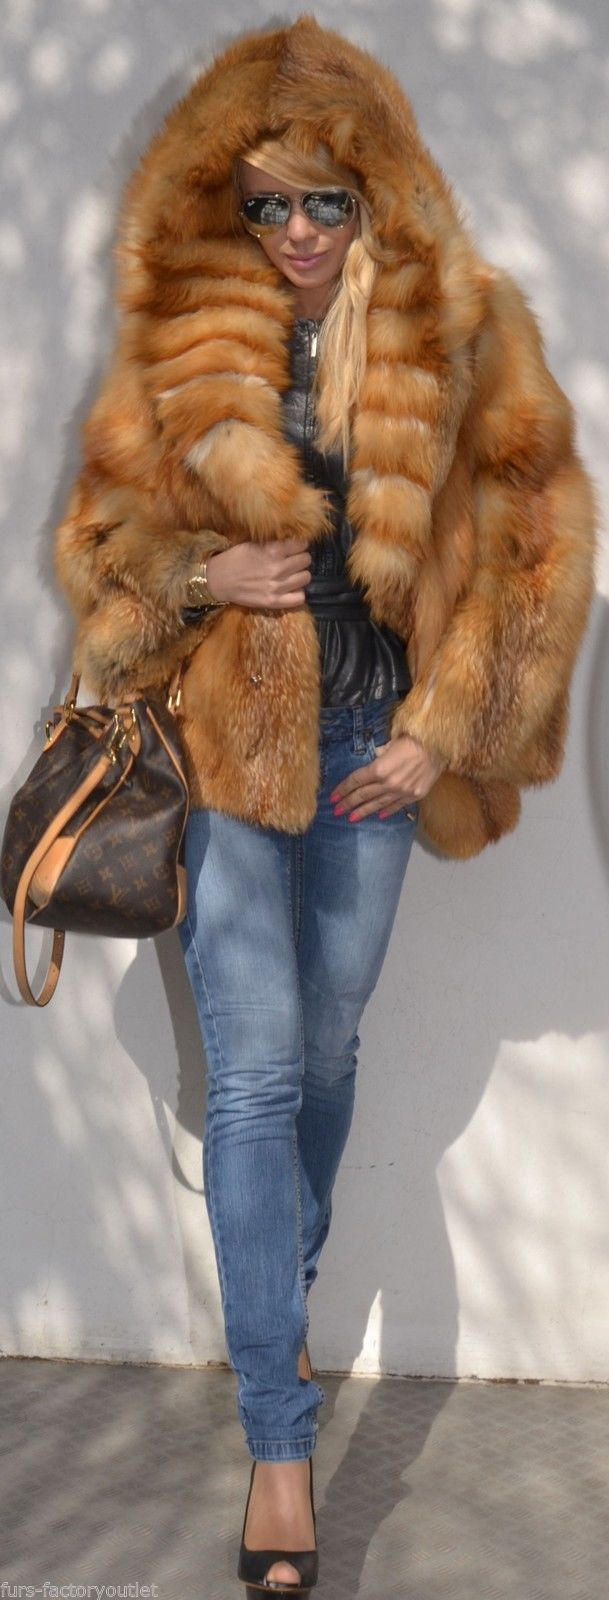 Lafuria FOX Jacket FUR Fuchs Jacke WIE Nerzjacke Mink Coat Mantel Zobel Pelz | eBay